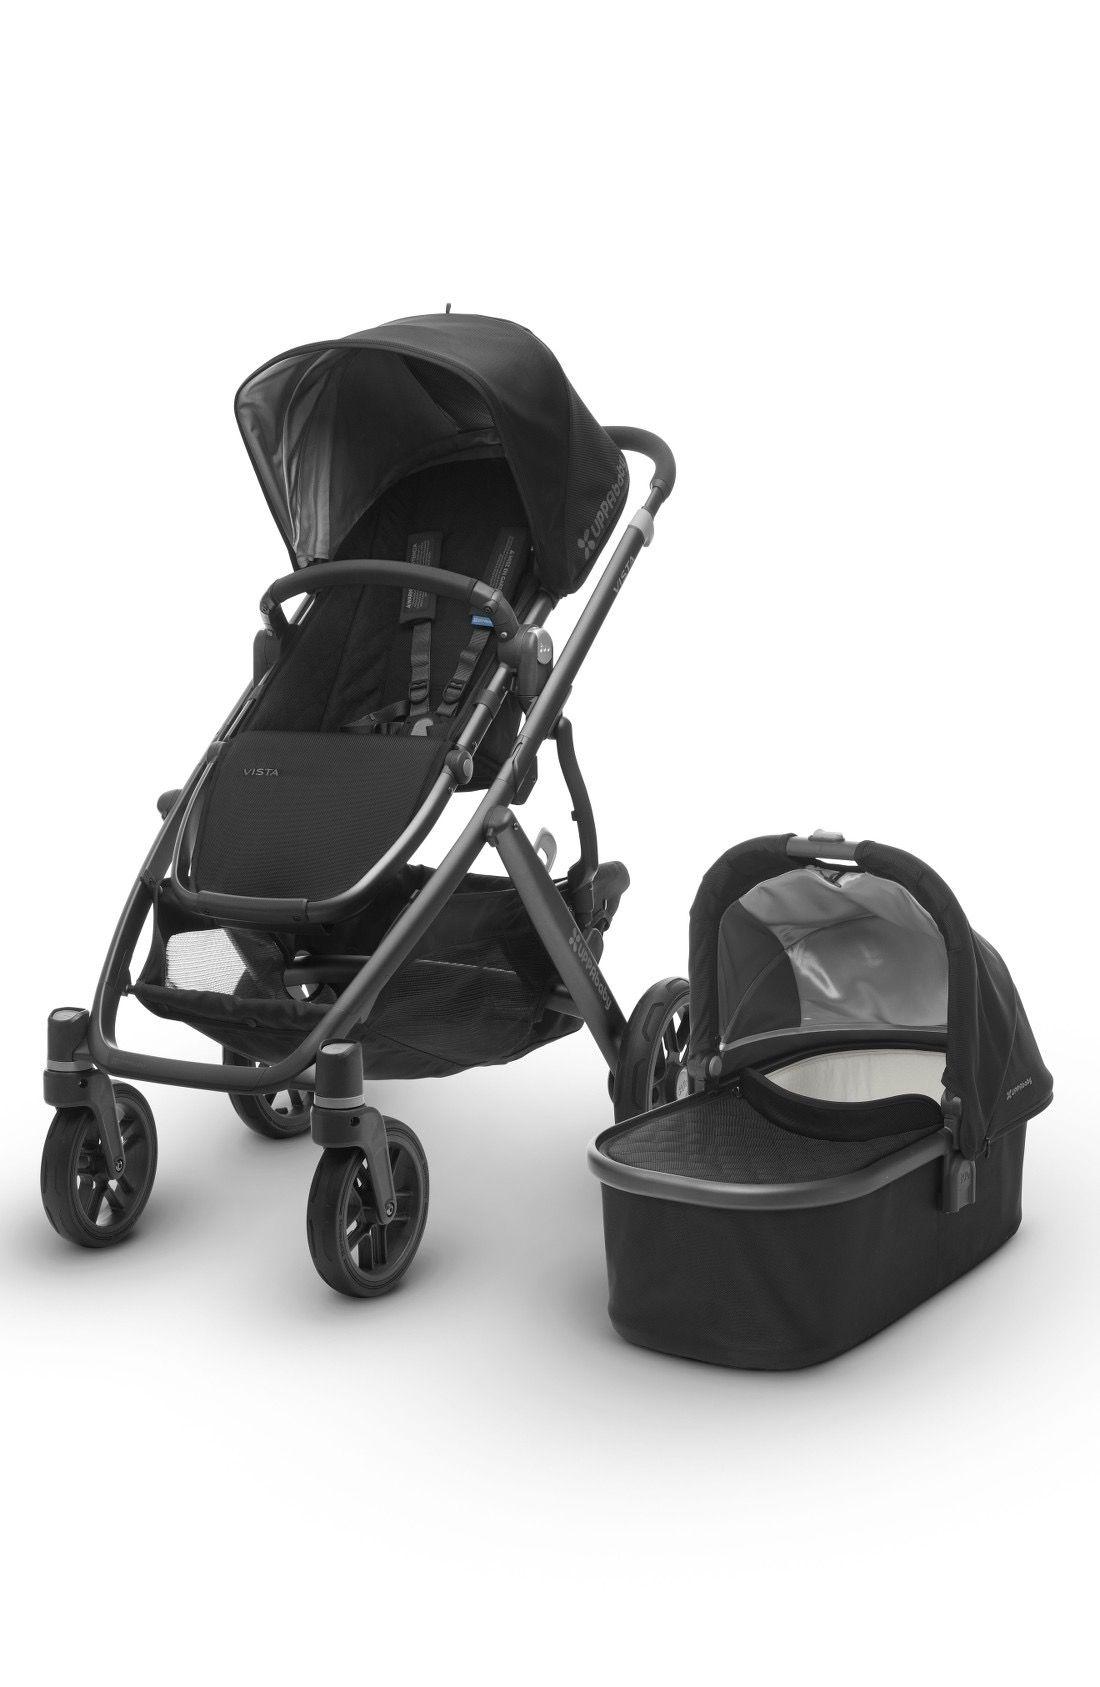 UPPAbaby 2017 VISTA Aluminum Frame Convertible Stroller